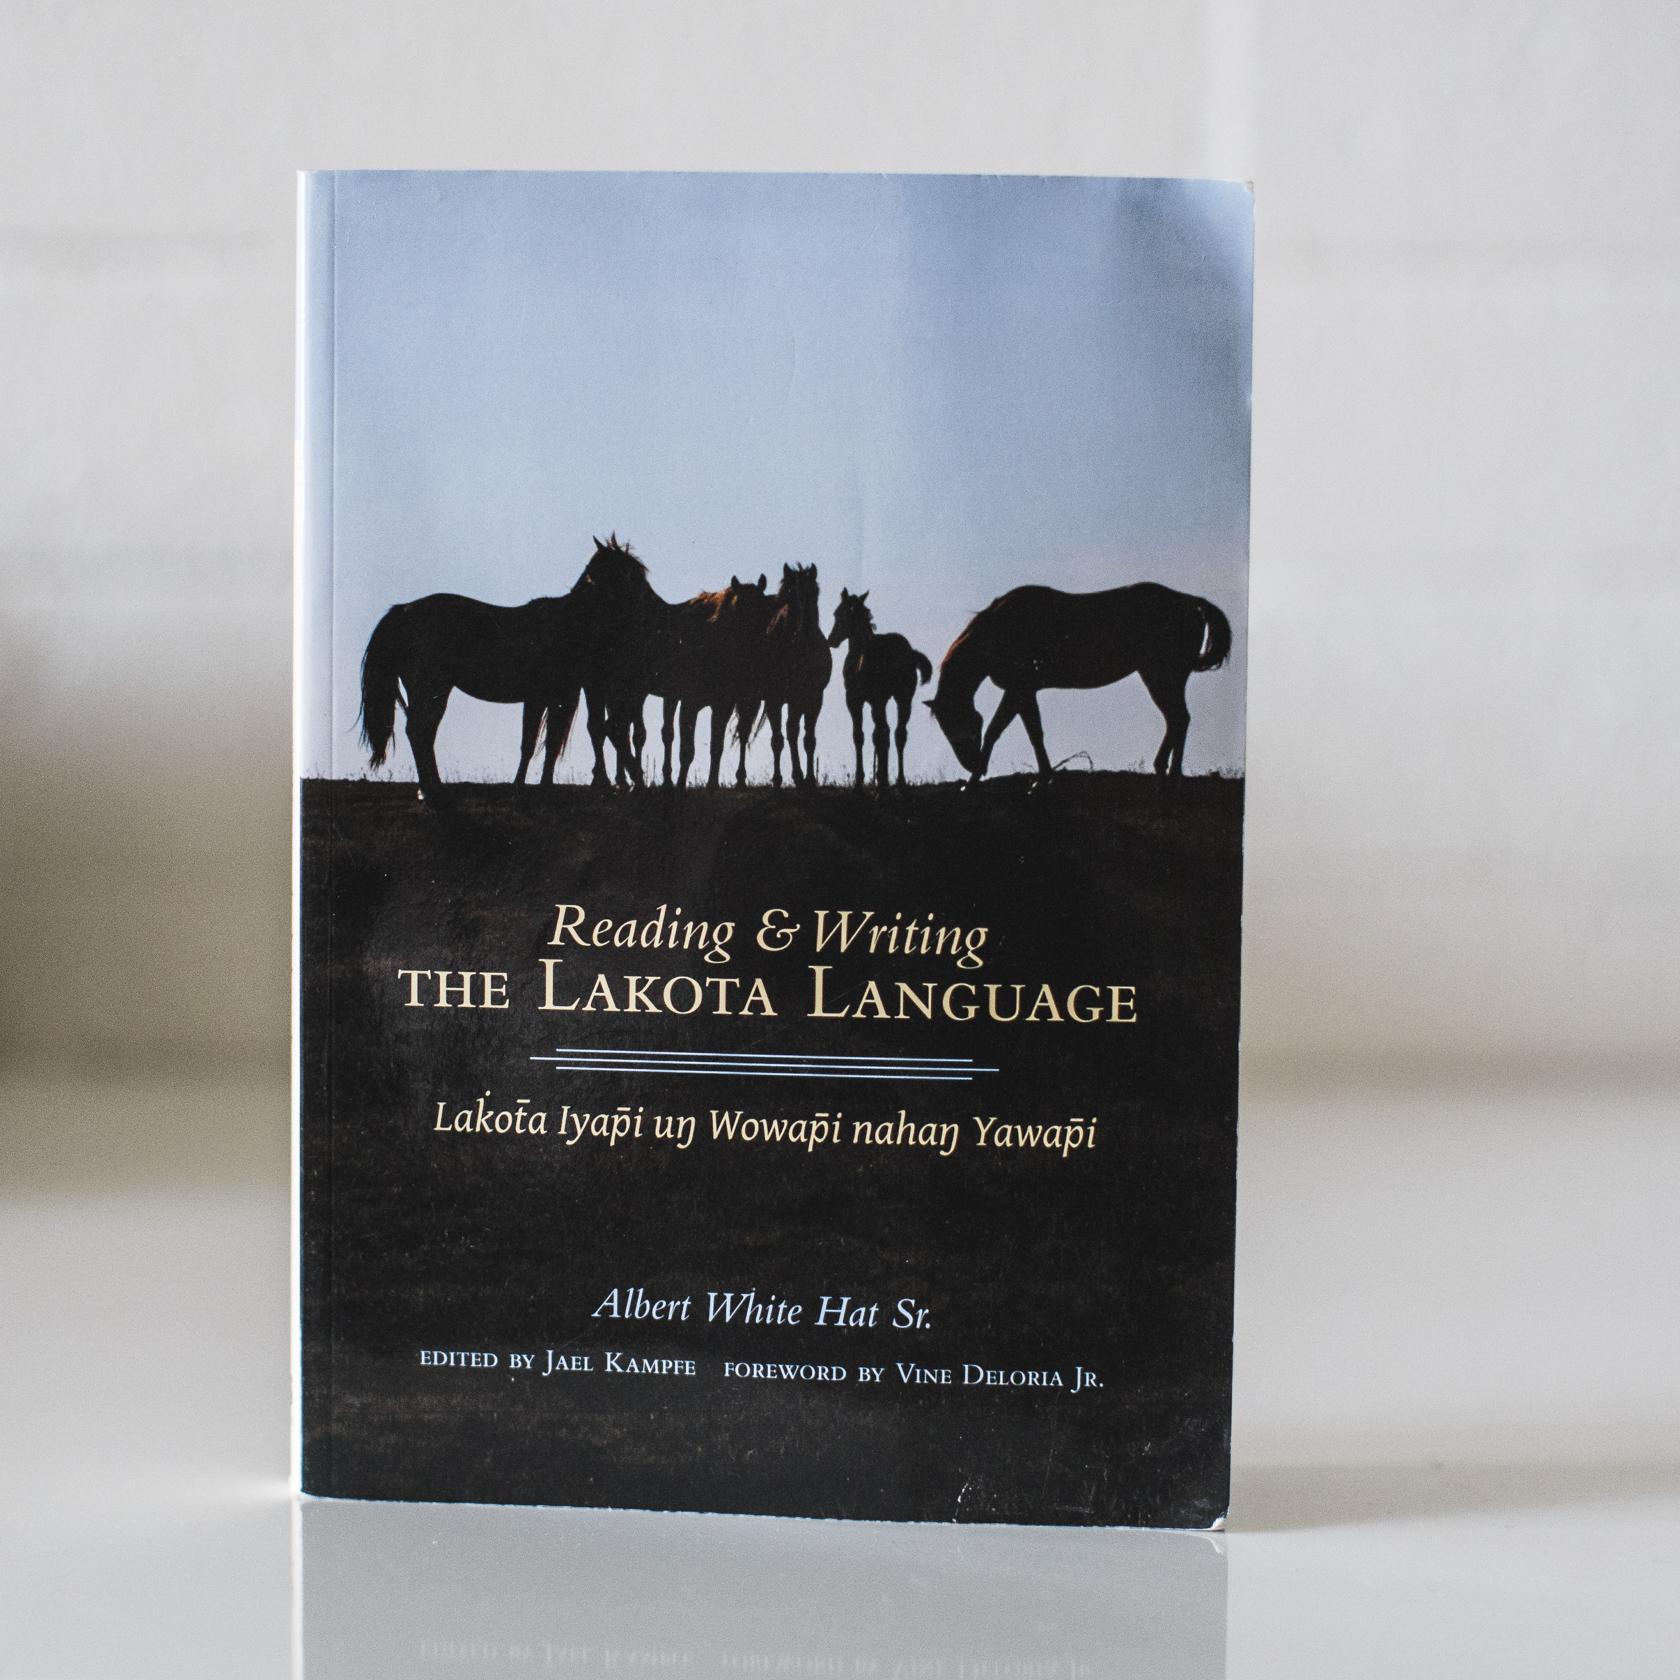 The Lakota Language